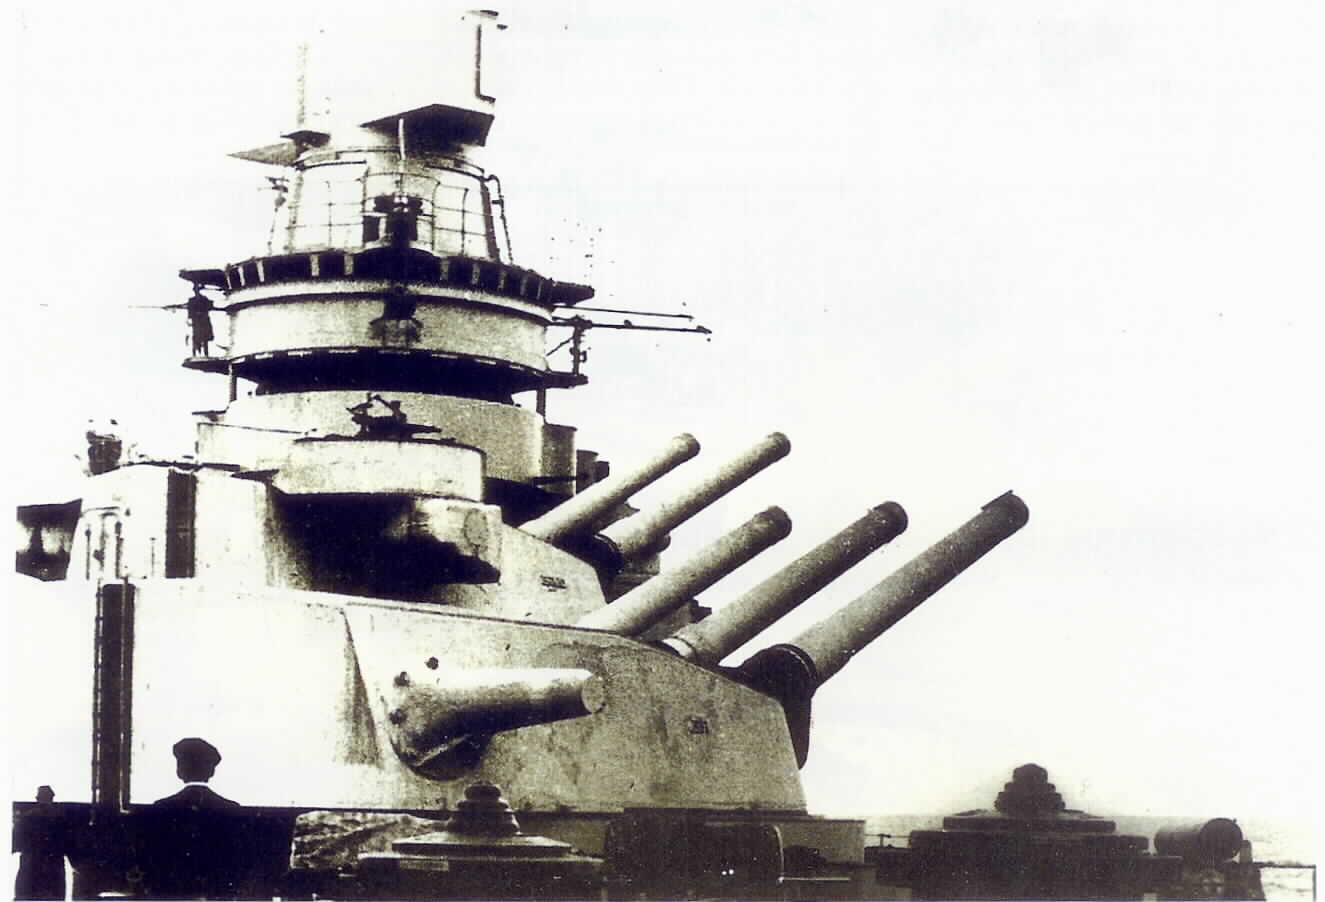 Andrea doria nave da battaglia takvim kalender hd for Andrea doria nave da guerra